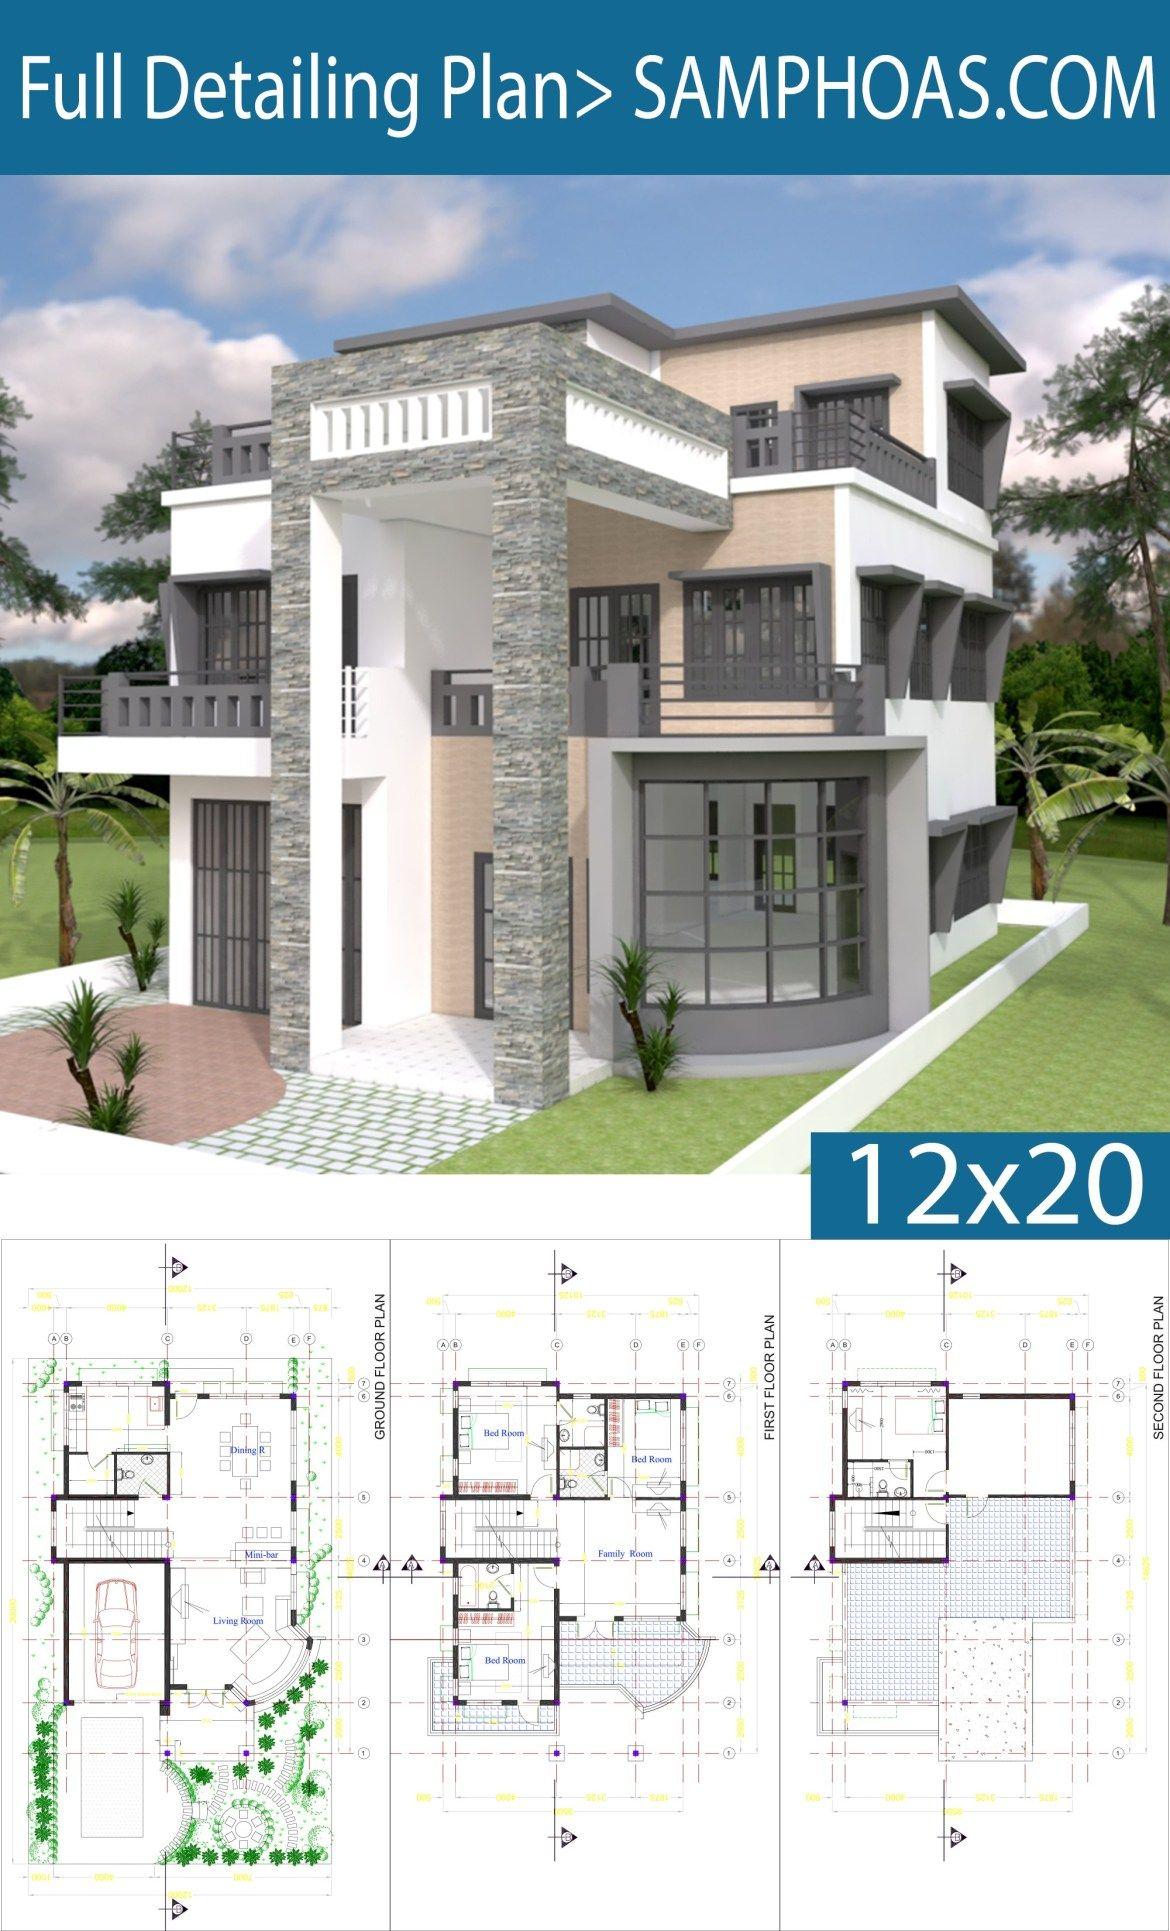 Modern House Plan 9x14 5m With 4 Bedrooms Samphoas Plansearch Modern House Floor Plans Modern House Plans Modern House Plan